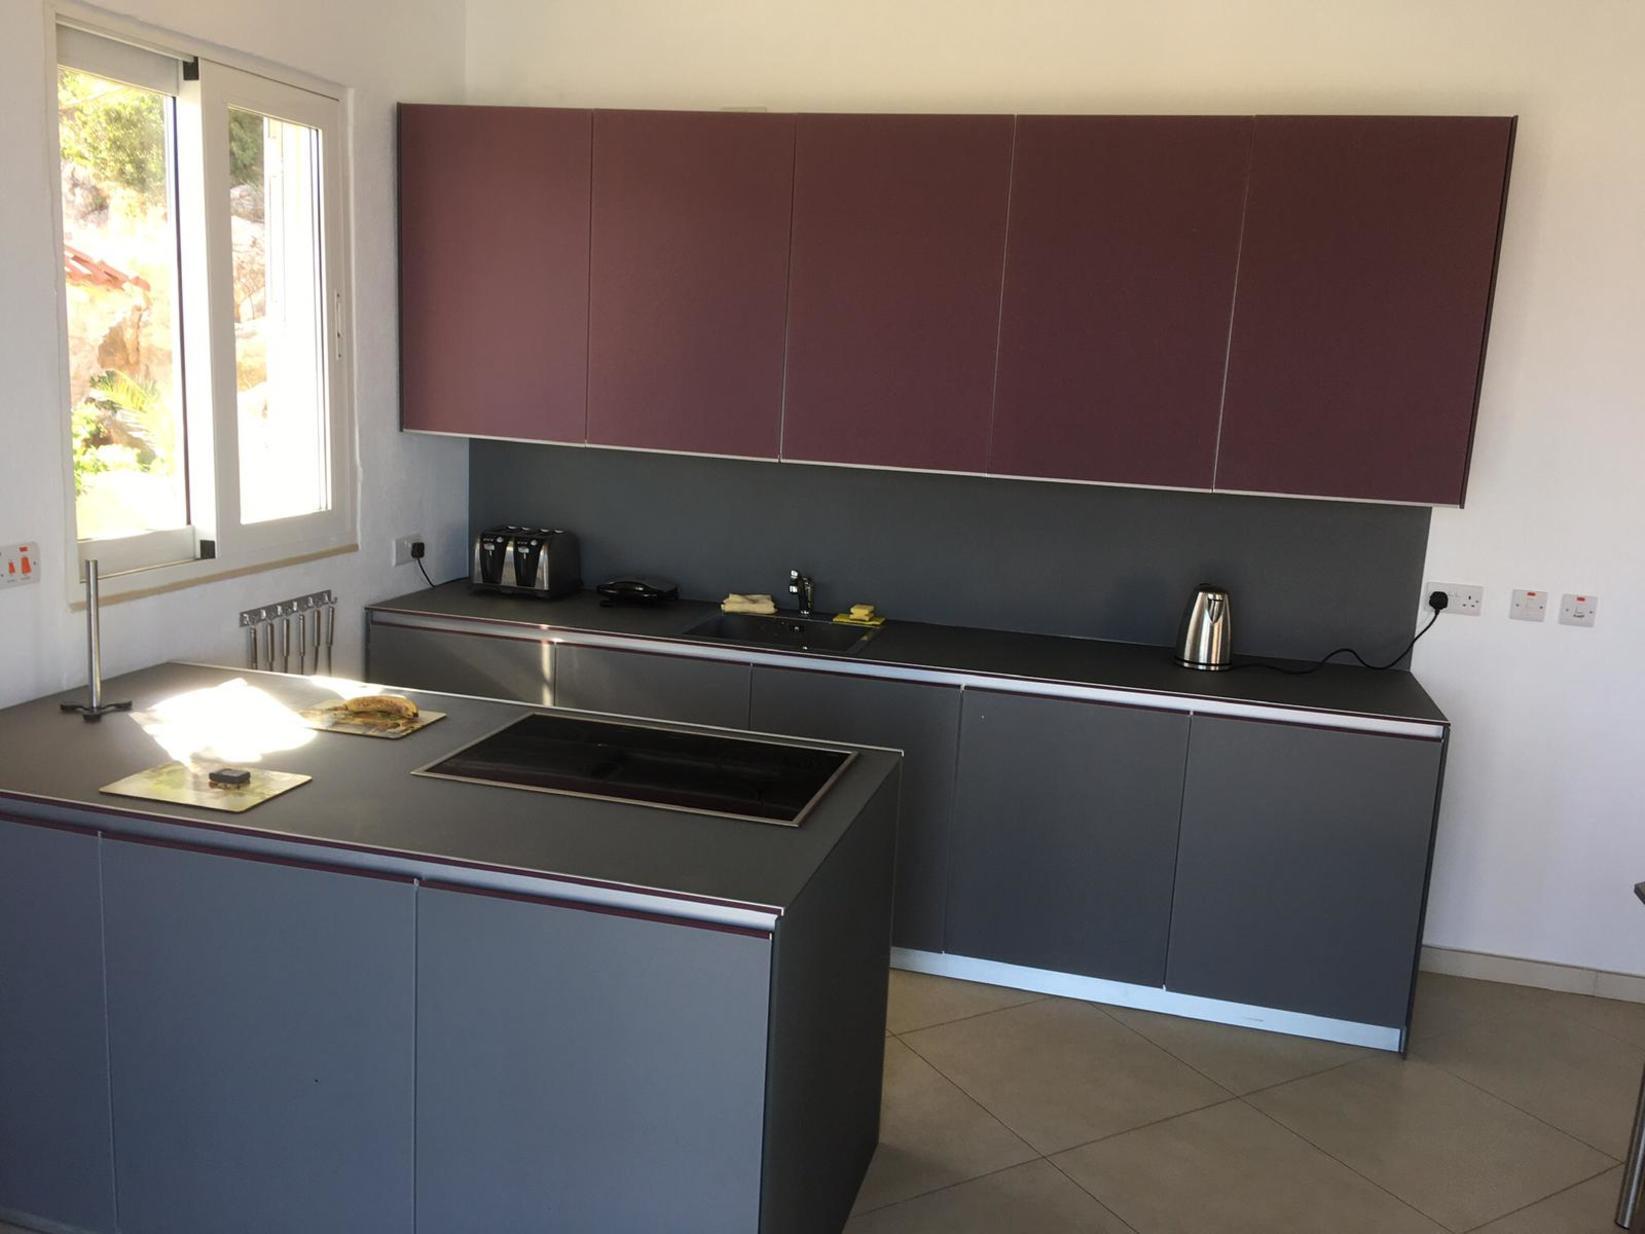 4 bed Villa For Rent in Mellieha, Mellieha - thumb 5